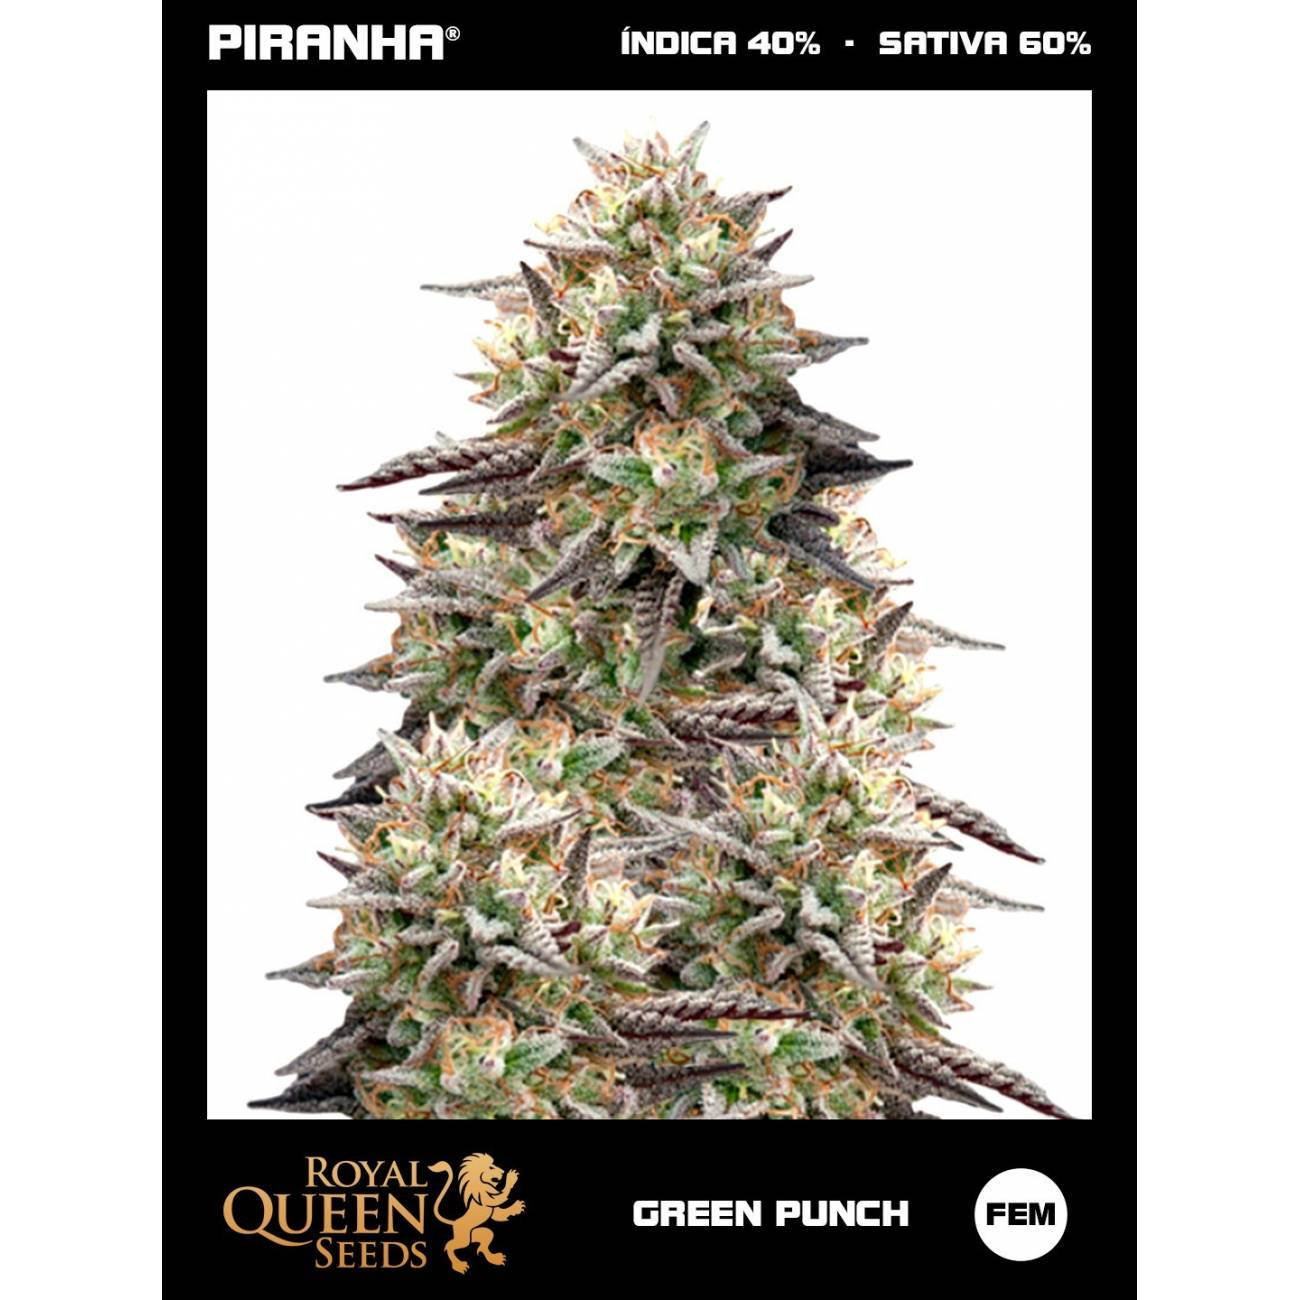 Green Punch (1u)